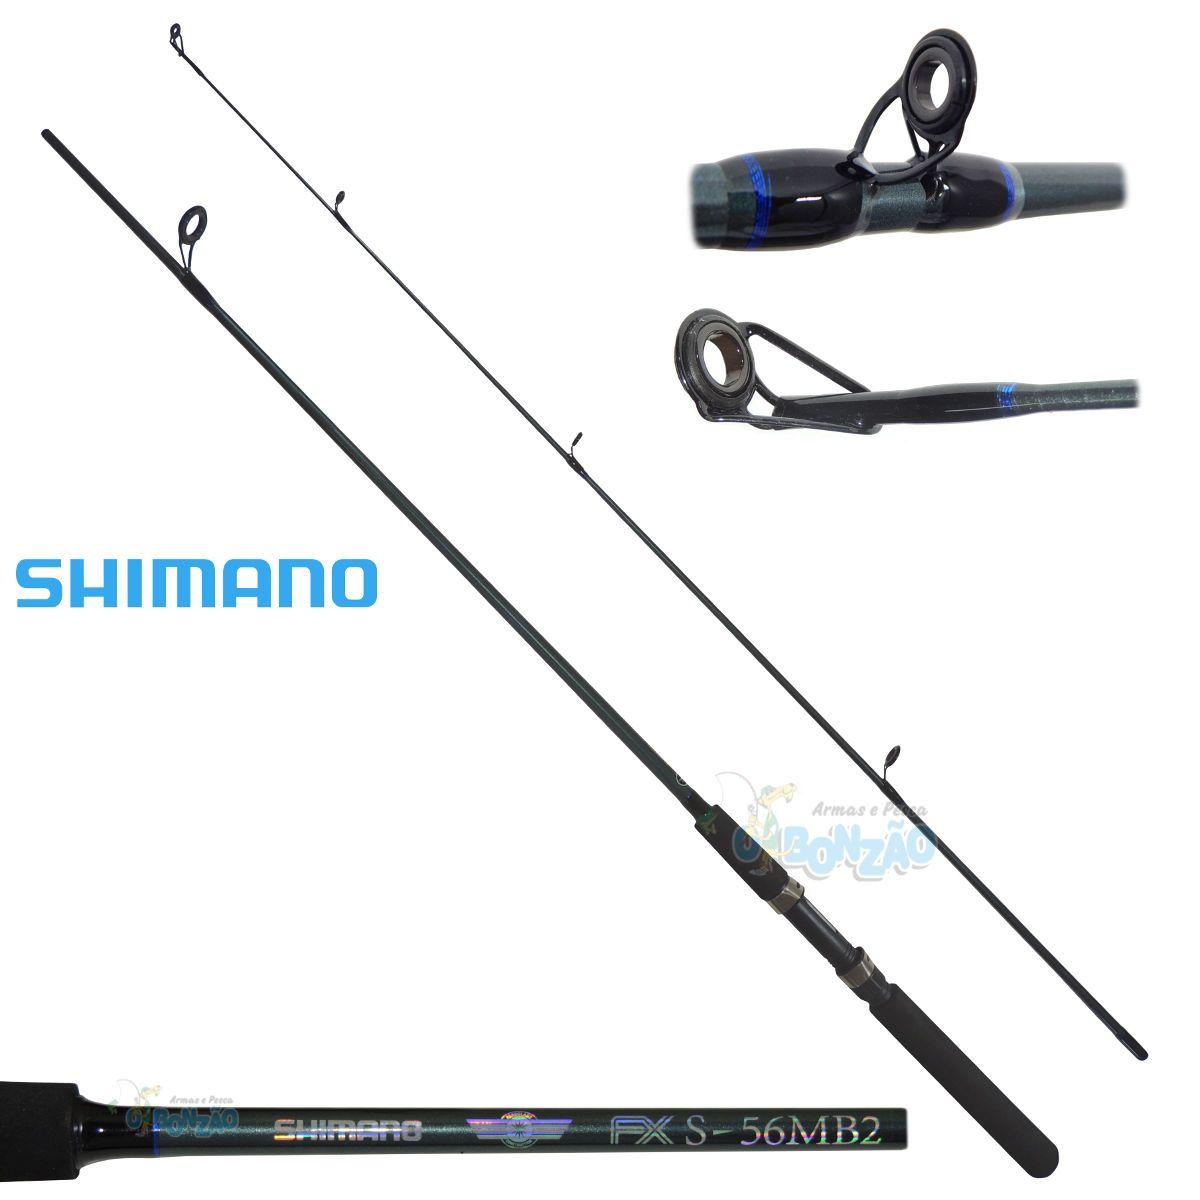 Vara Shimano FX S56MB2 - 6-14lbs - 1,68m - Molinete - 2 Partes